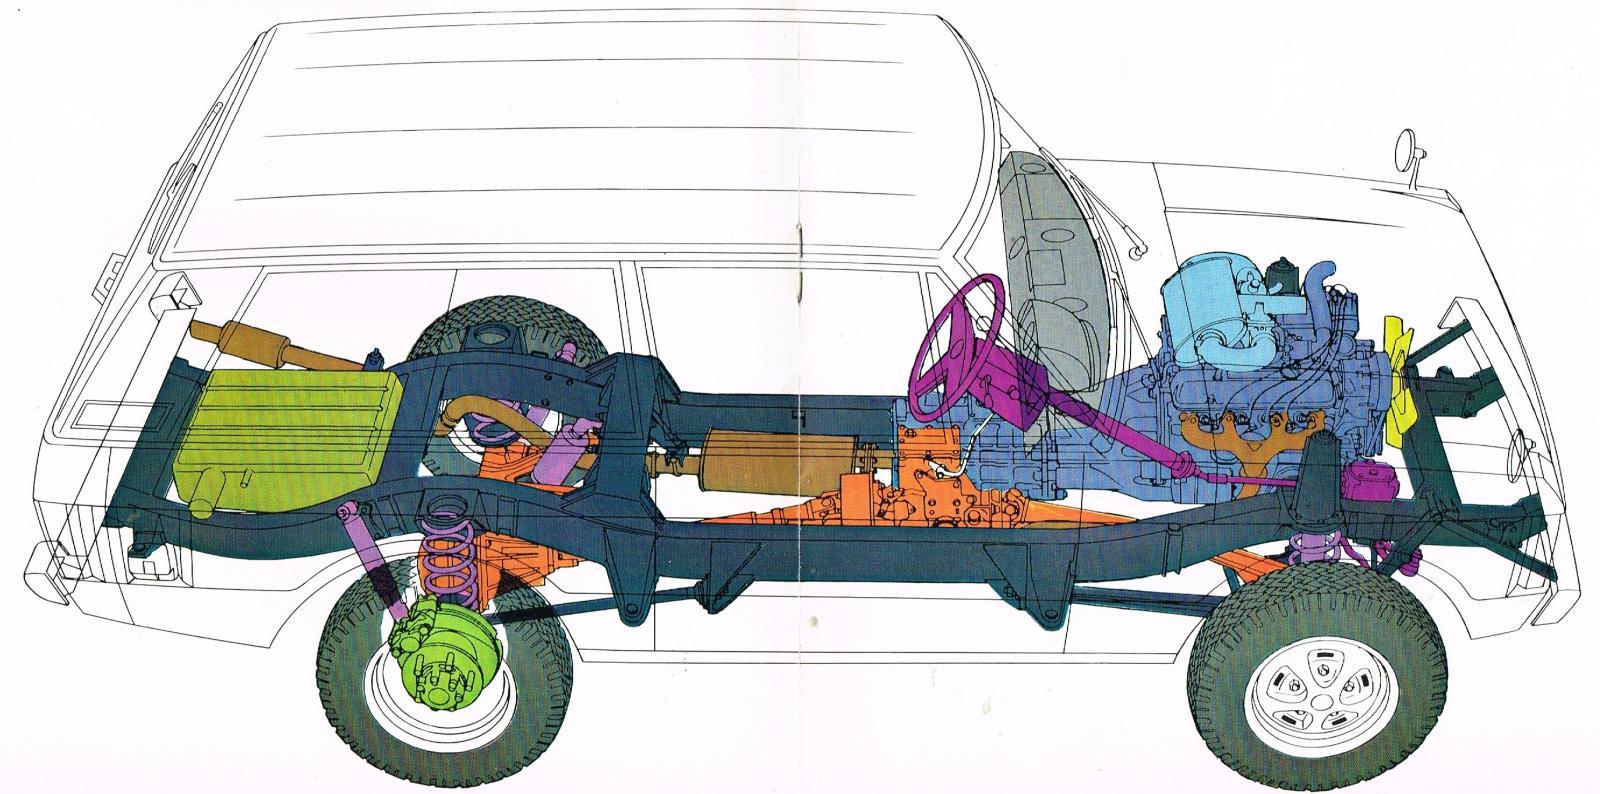 Range Rover Mar 74 brochure 08-09.jpg